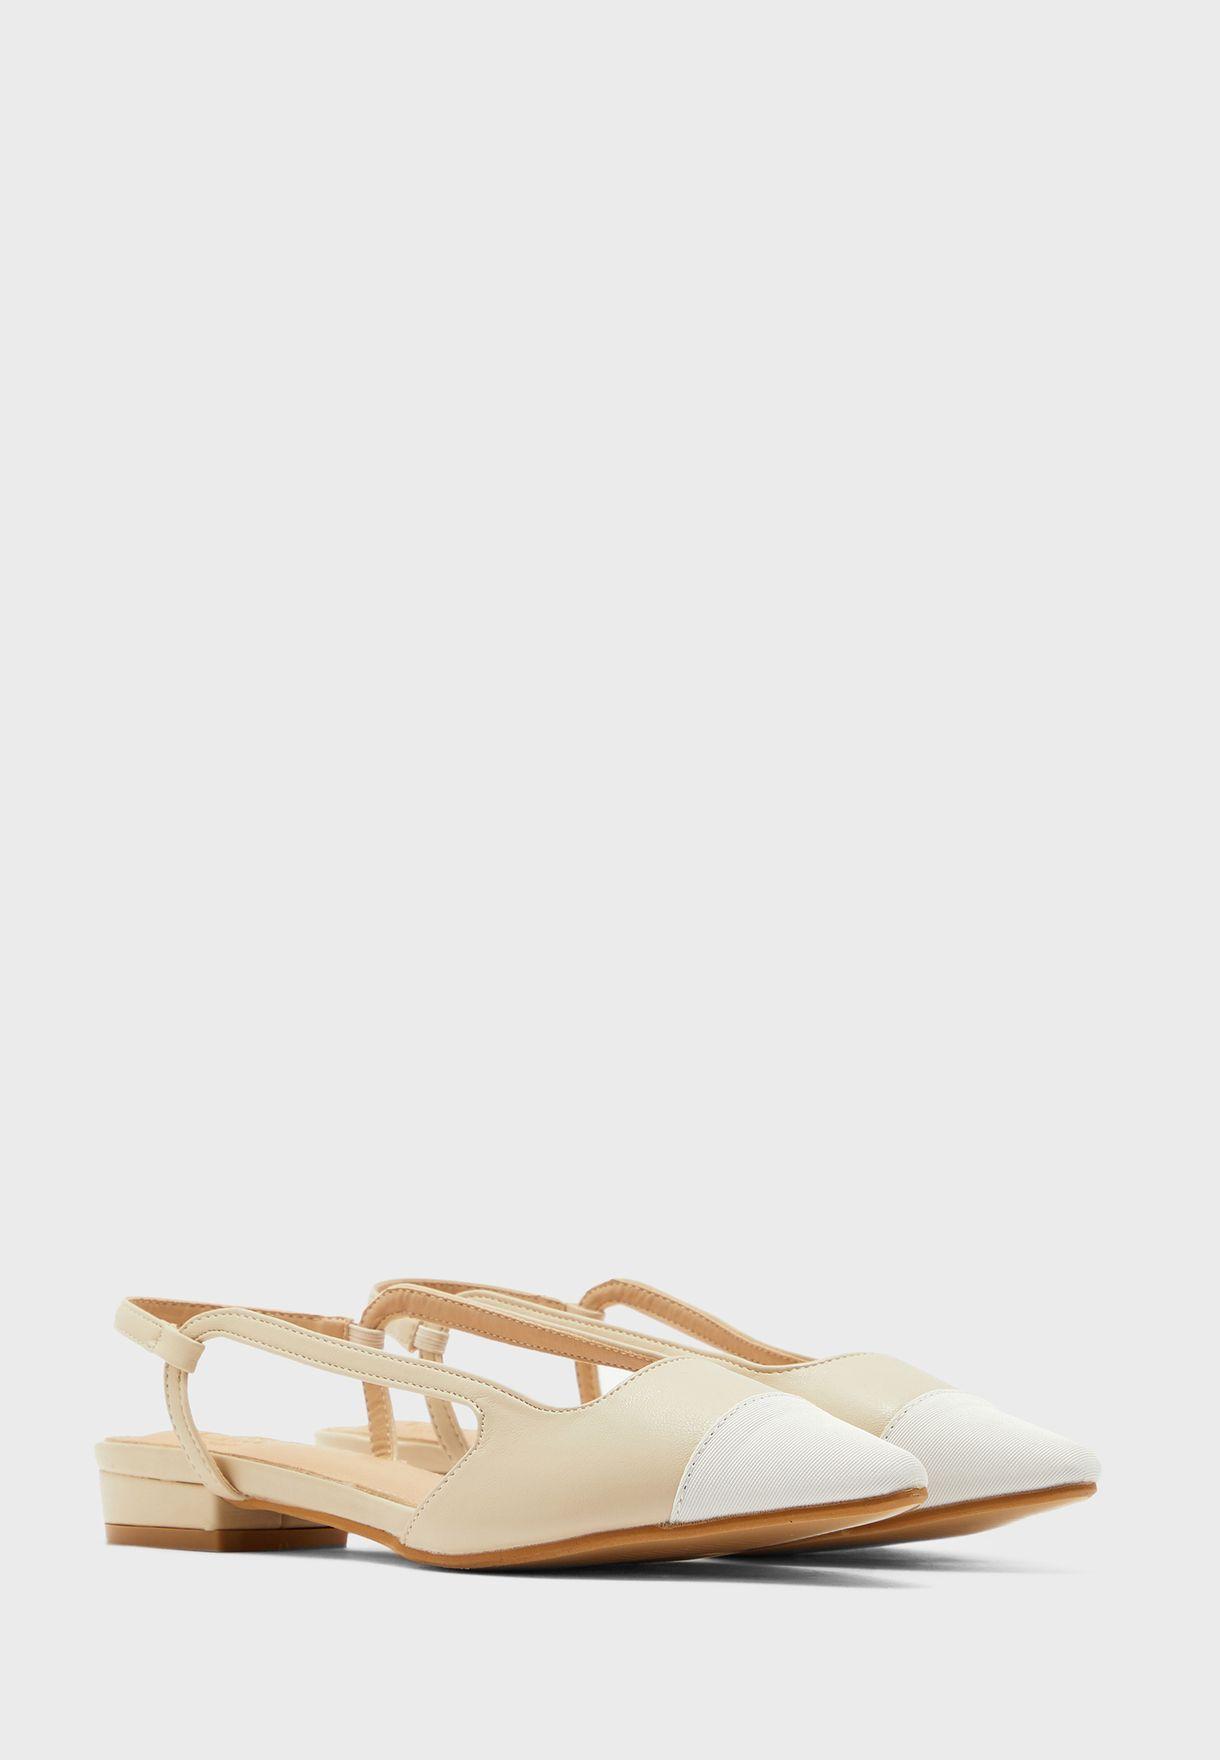 Colourblock Pointed Slingback Shoe